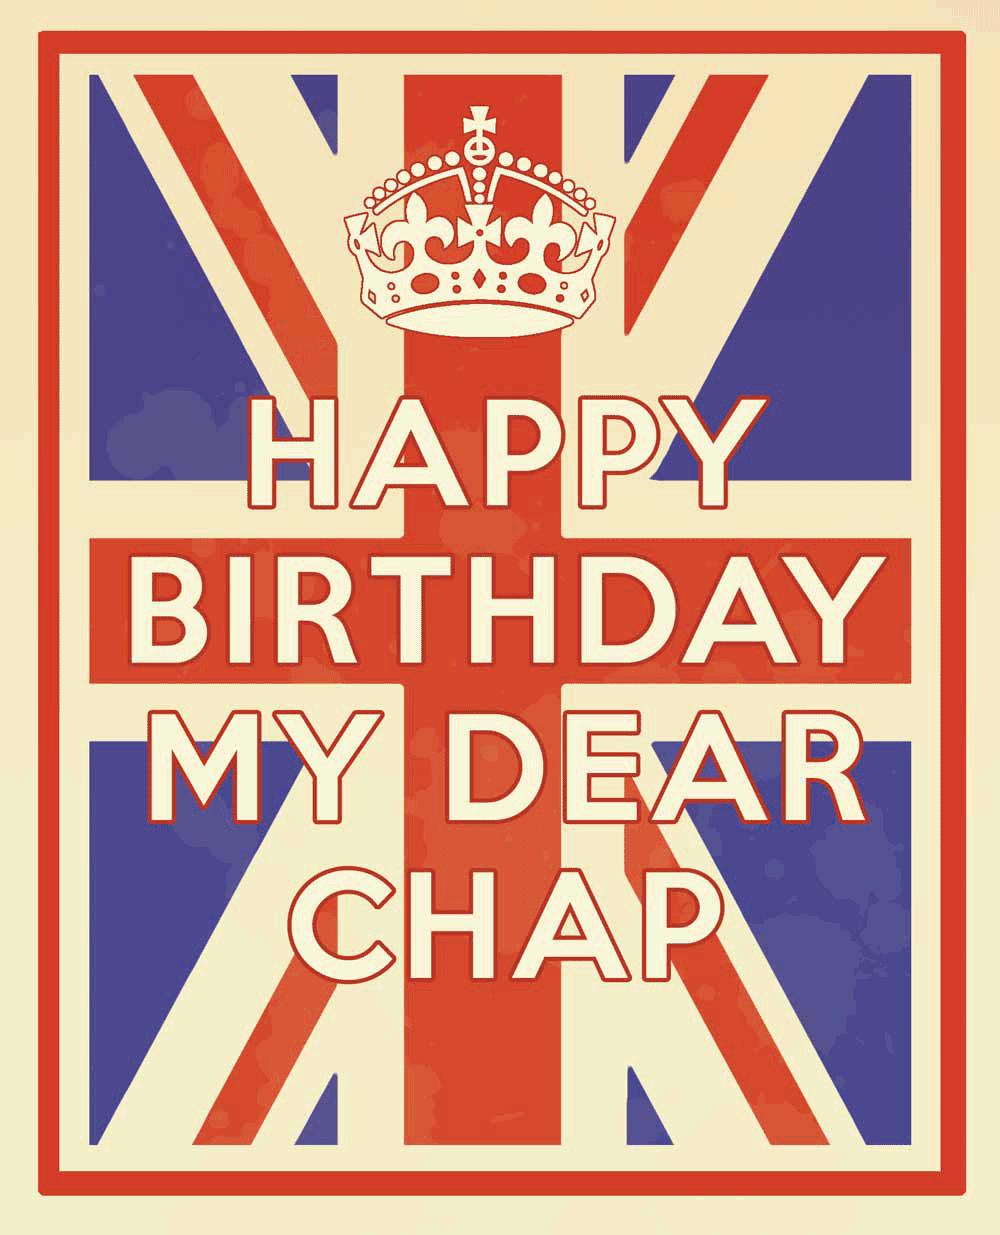 Happy Birthday My Dear Chap. The Best of British